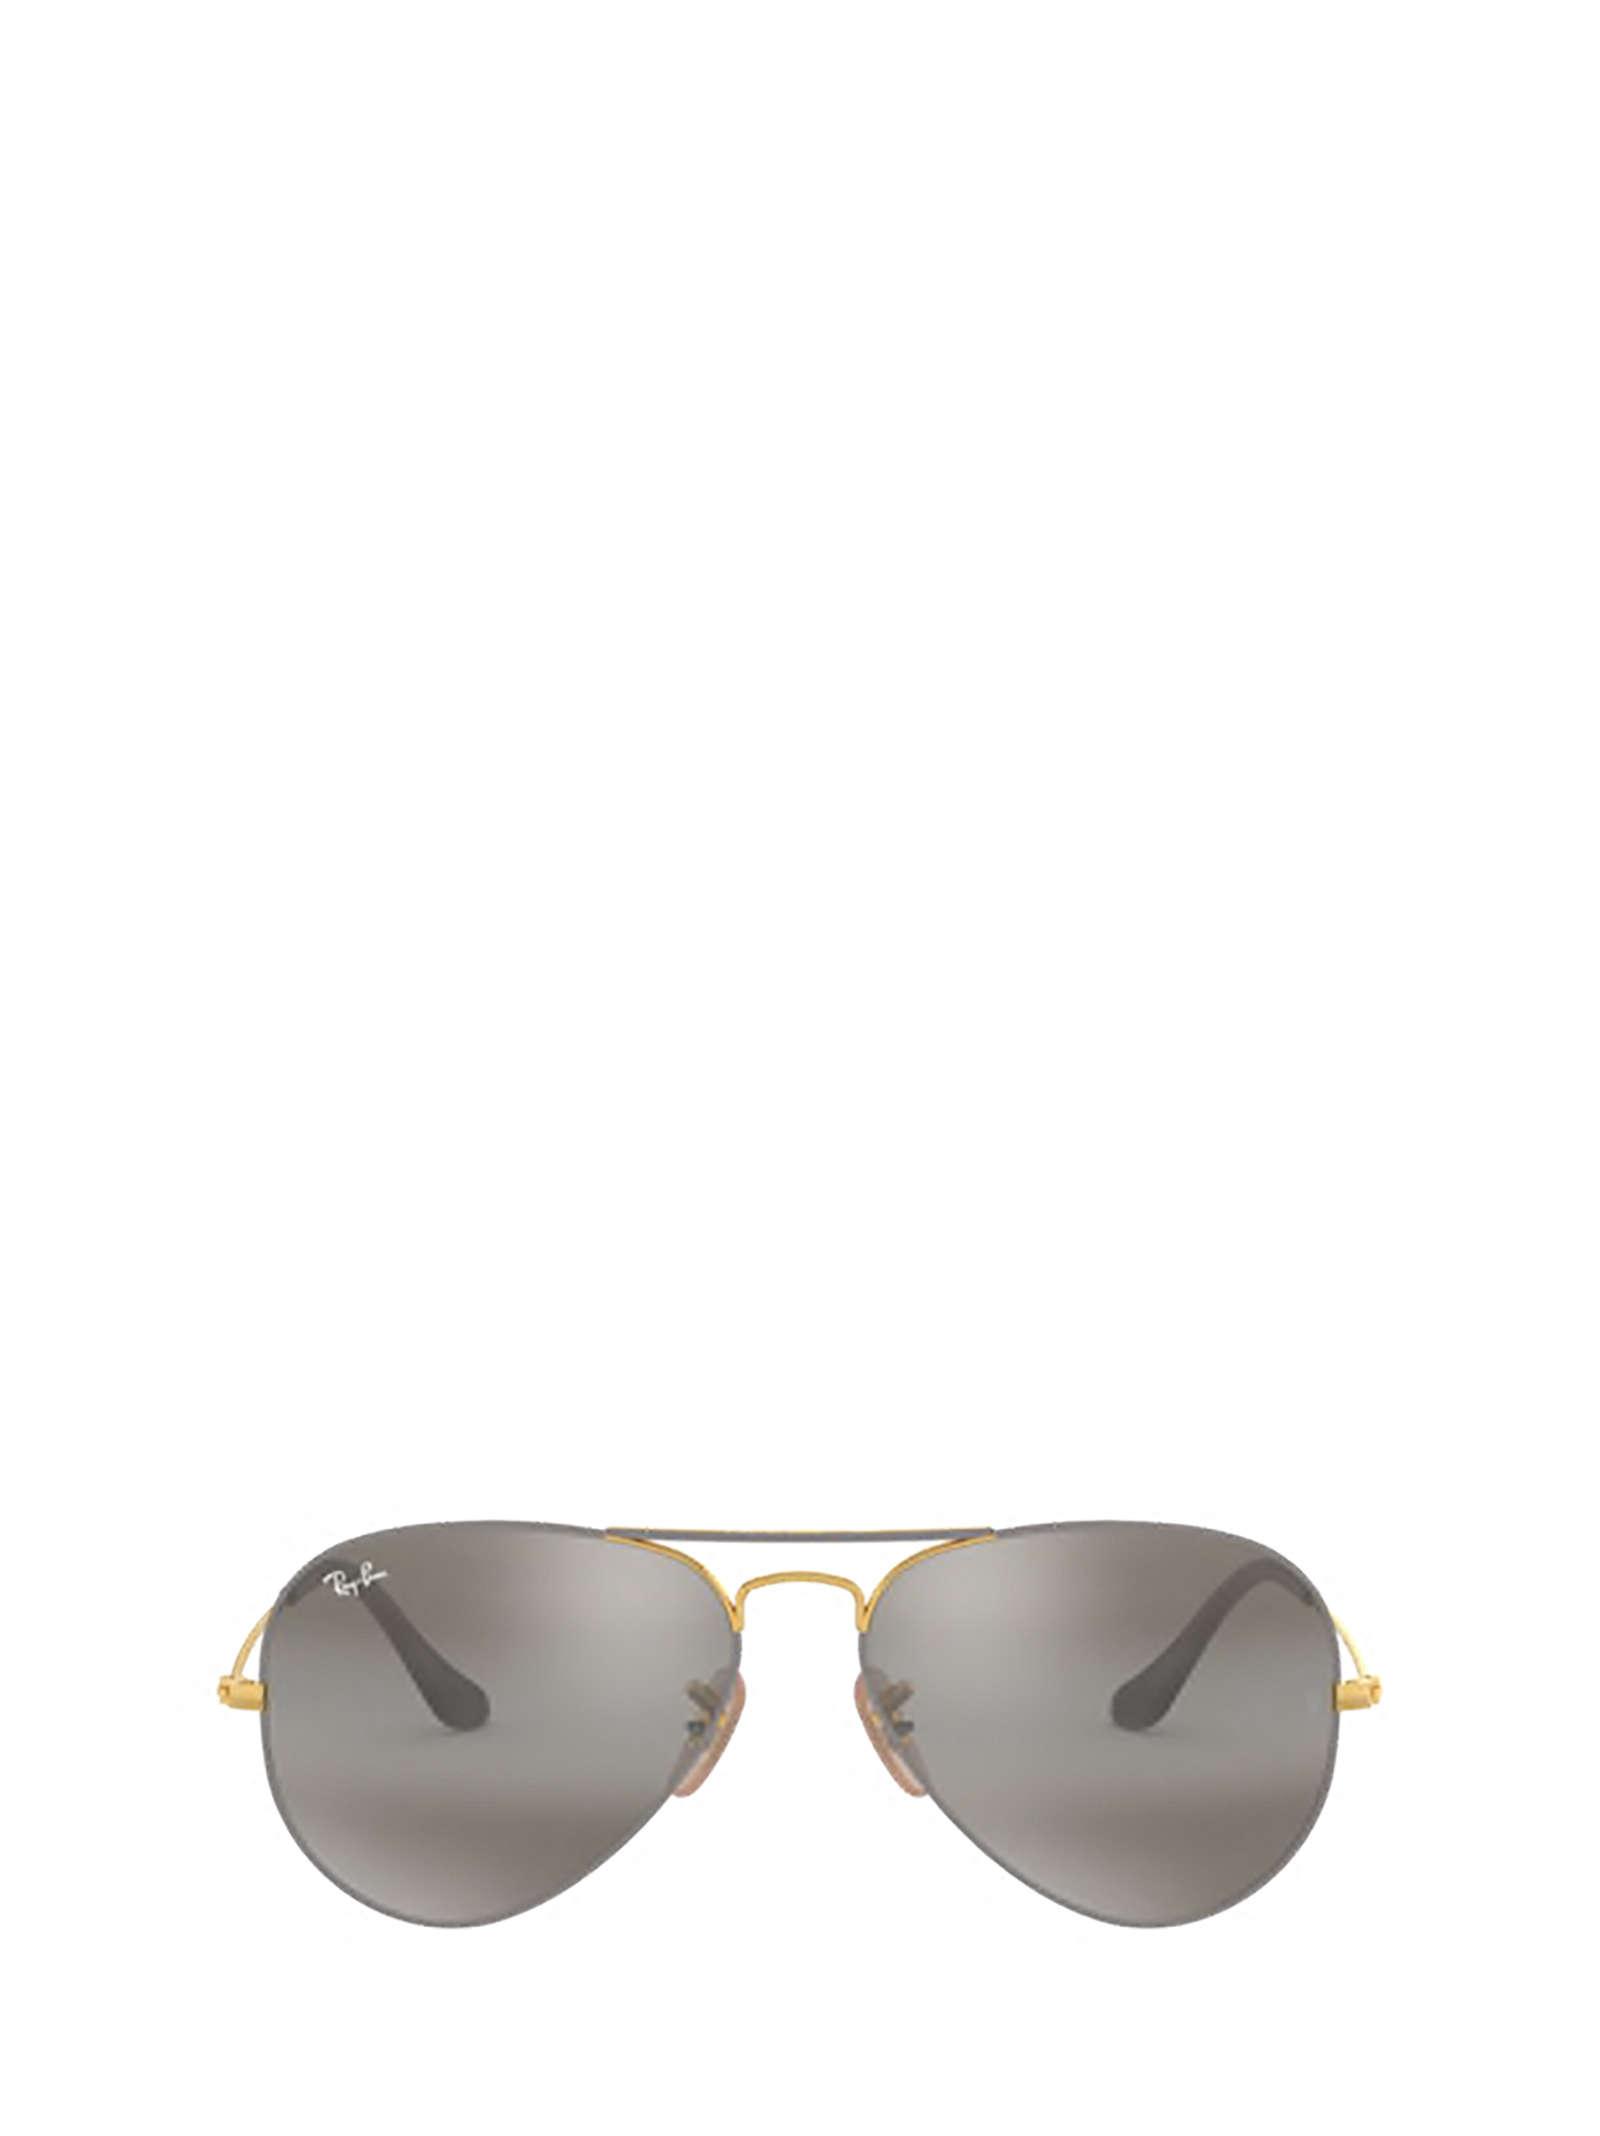 Ray-Ban Ray-ban Rb3025 Gold On Top Matte Grey Sunglasses